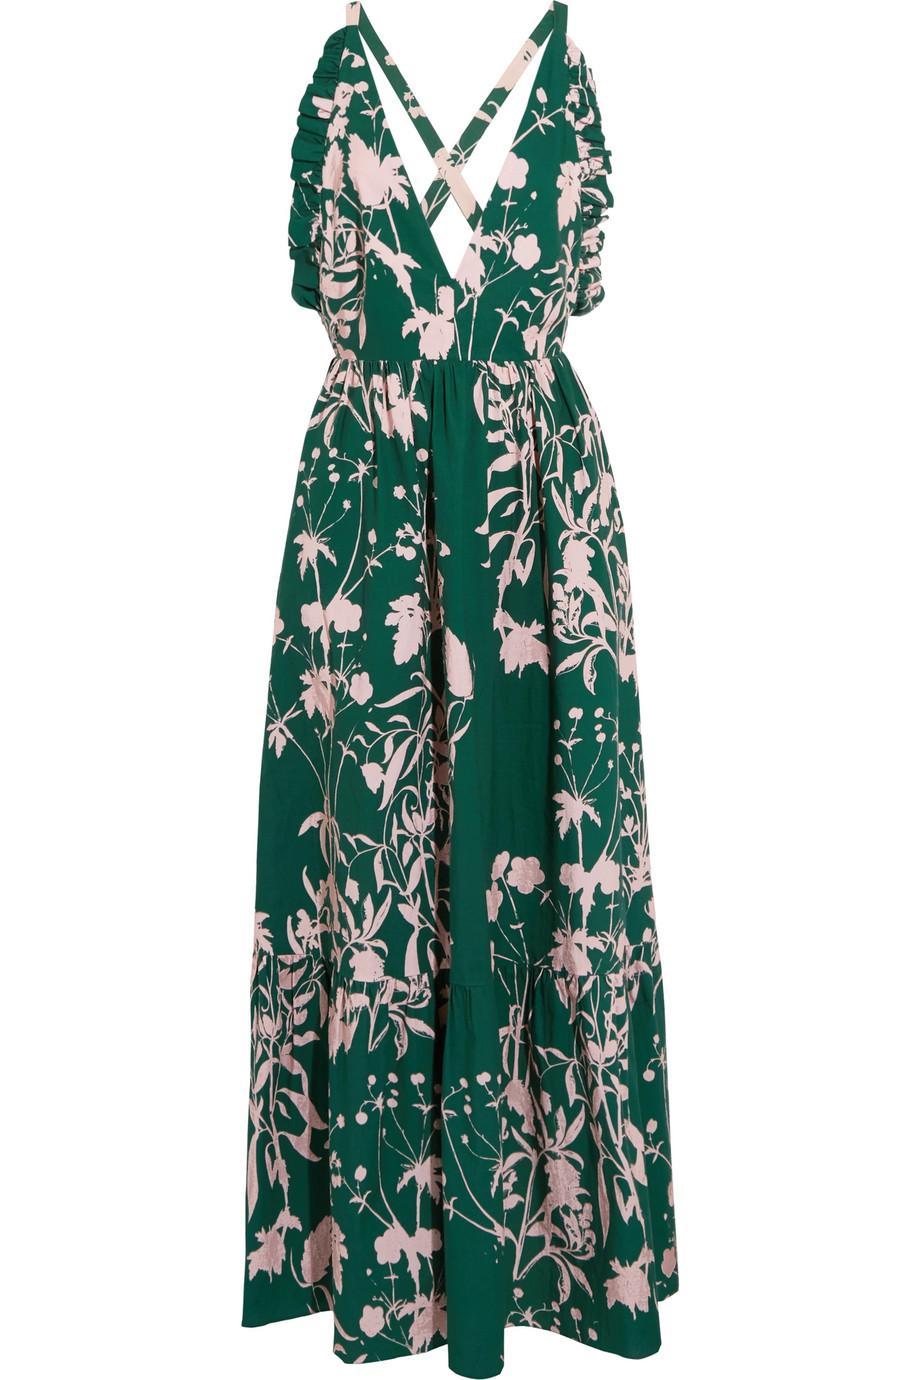 Eugenia Crepe Long Sleeve Midi Dress Borgo De Nor Outlet 2018 New spG4VolFfd